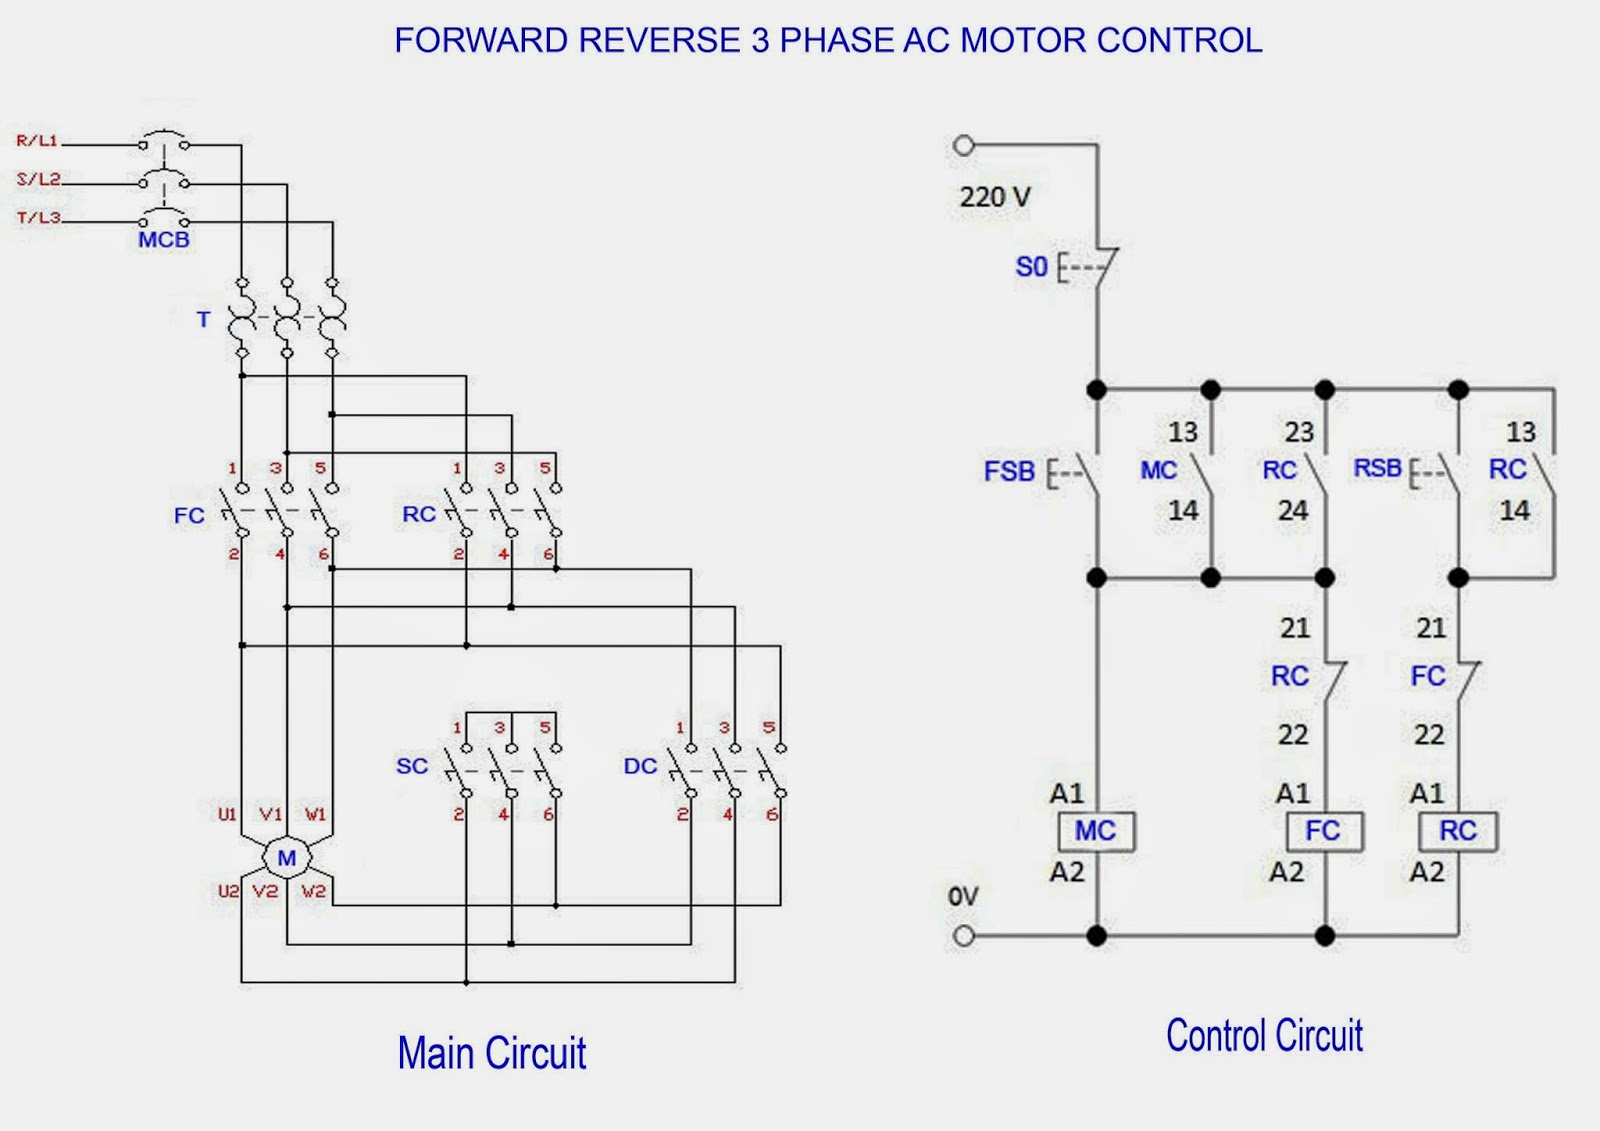 forward reverse 3 phase ac motor control star delta wiring forward reverse motor control circuit diagram pdf forward reverse motor control wiring [ 1600 x 1131 Pixel ]